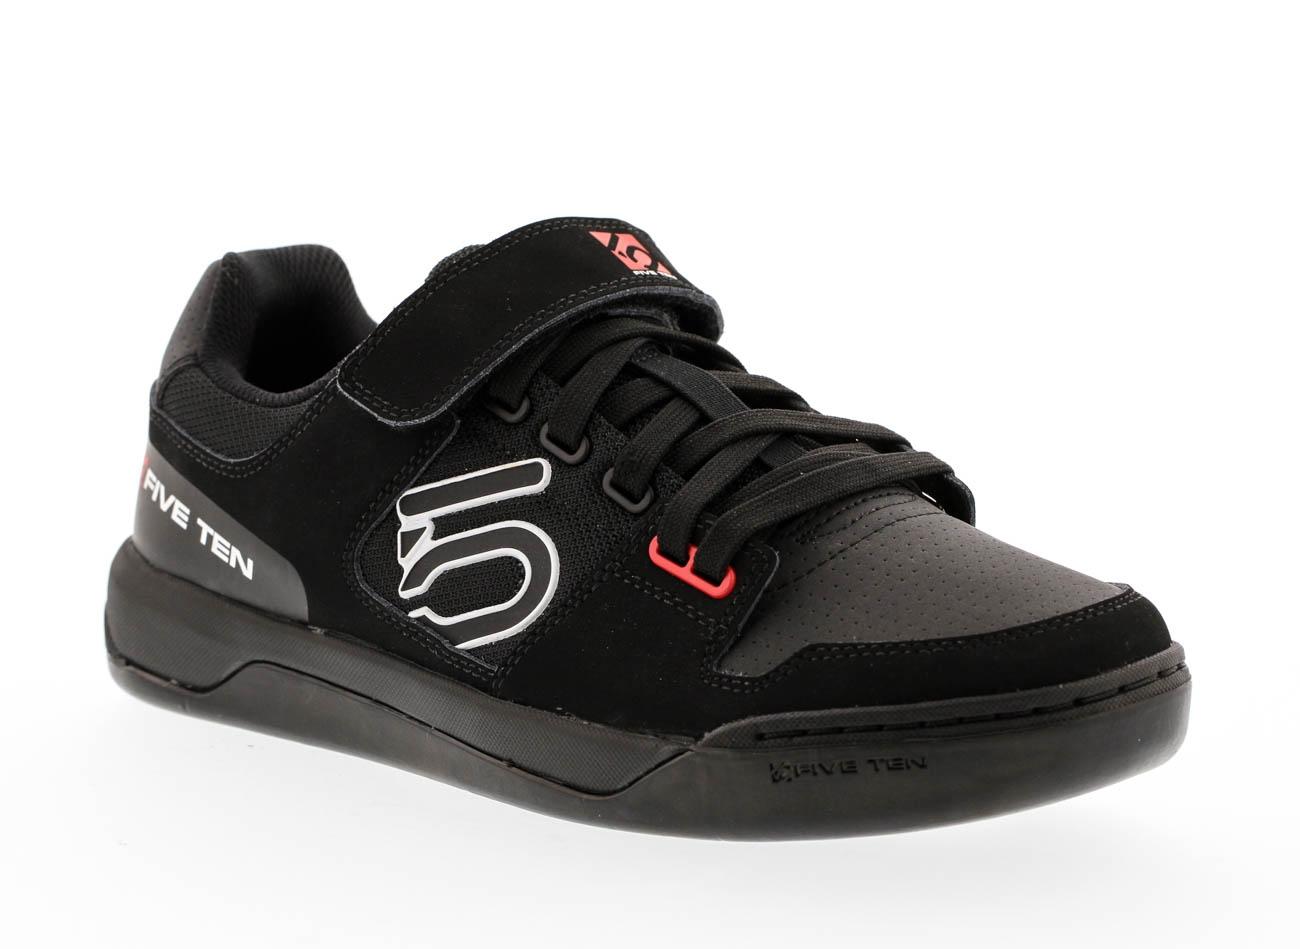 Chaussures Five Ten HELLCAT Noir/Blanc - UK-9.0 (43.0)